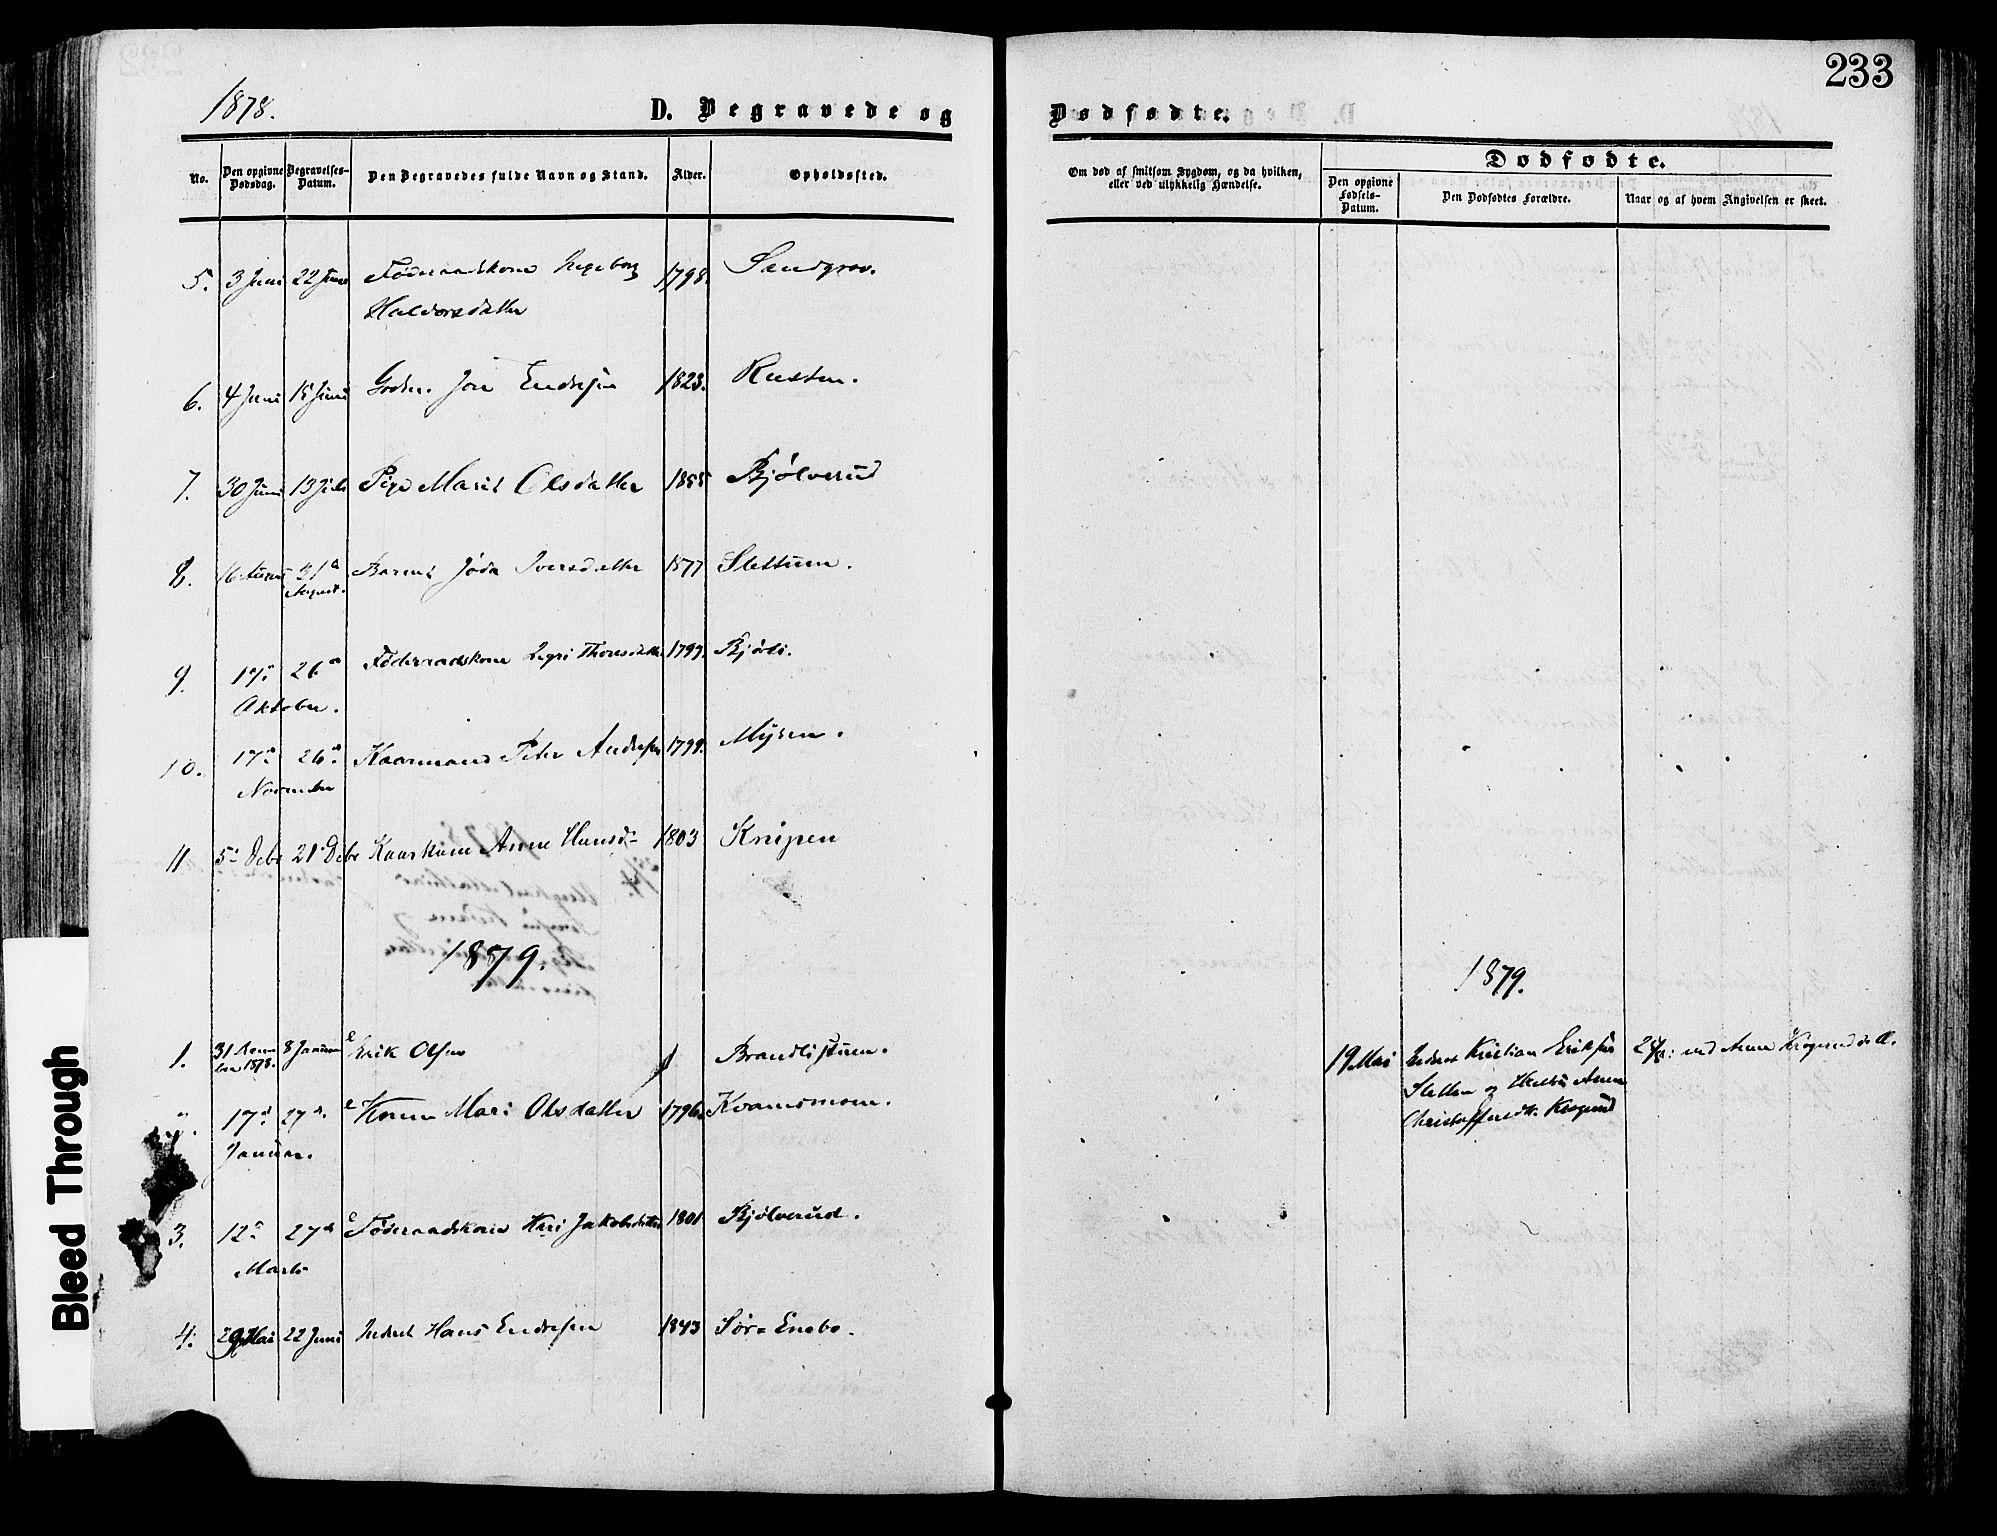 SAH, Lesja prestekontor, Ministerialbok nr. 9, 1854-1889, s. 233